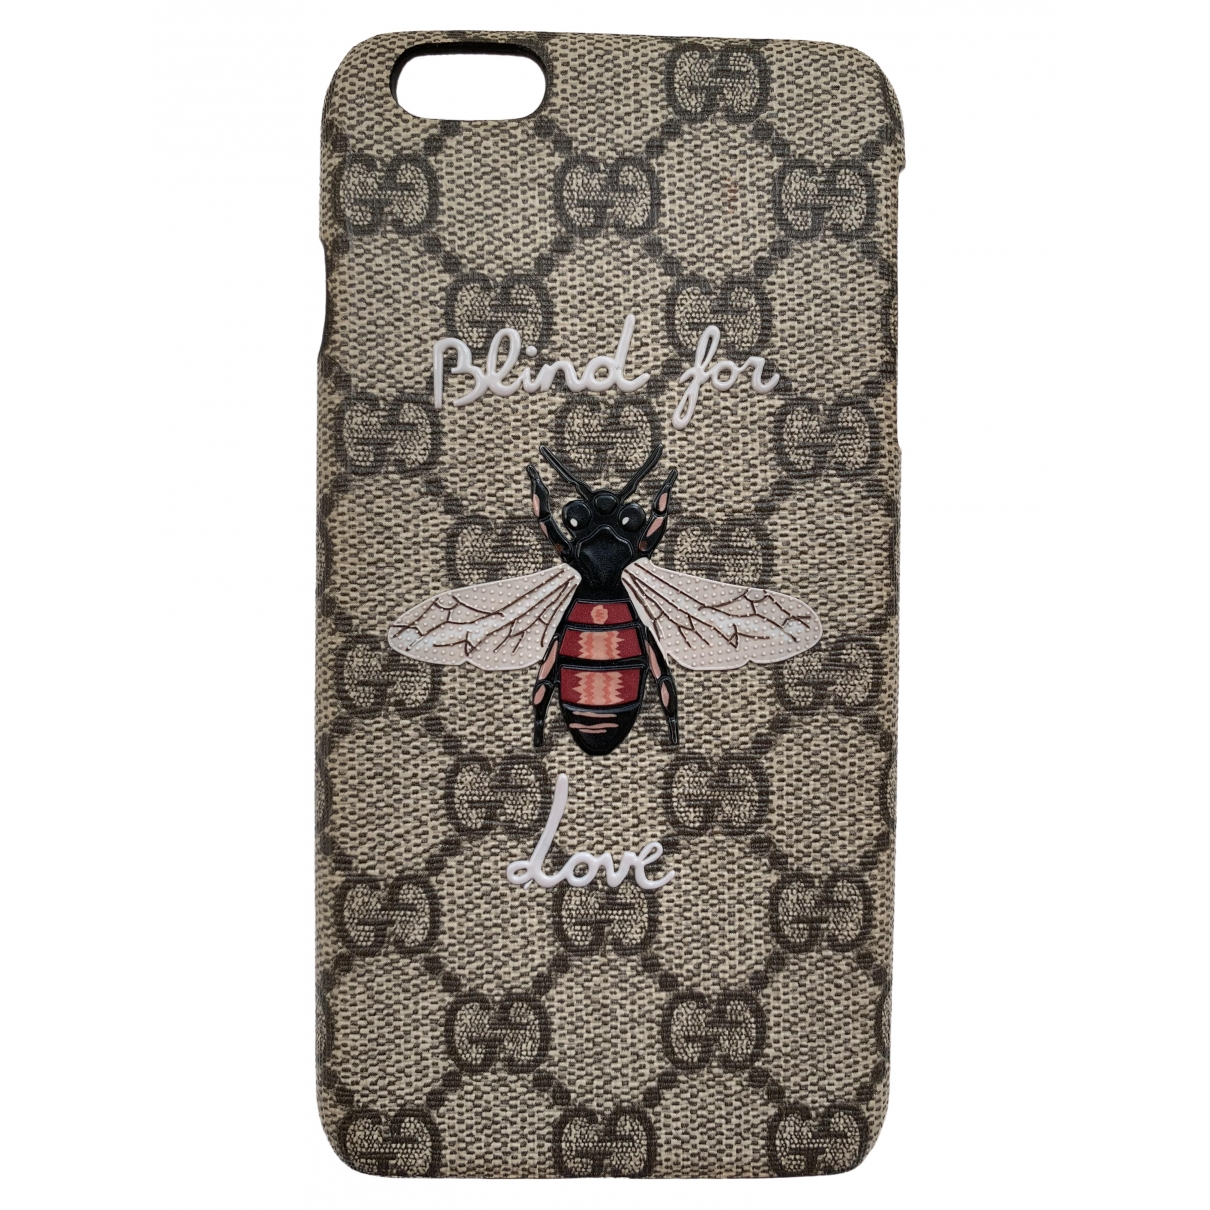 Funda iphone de Lona Gucci